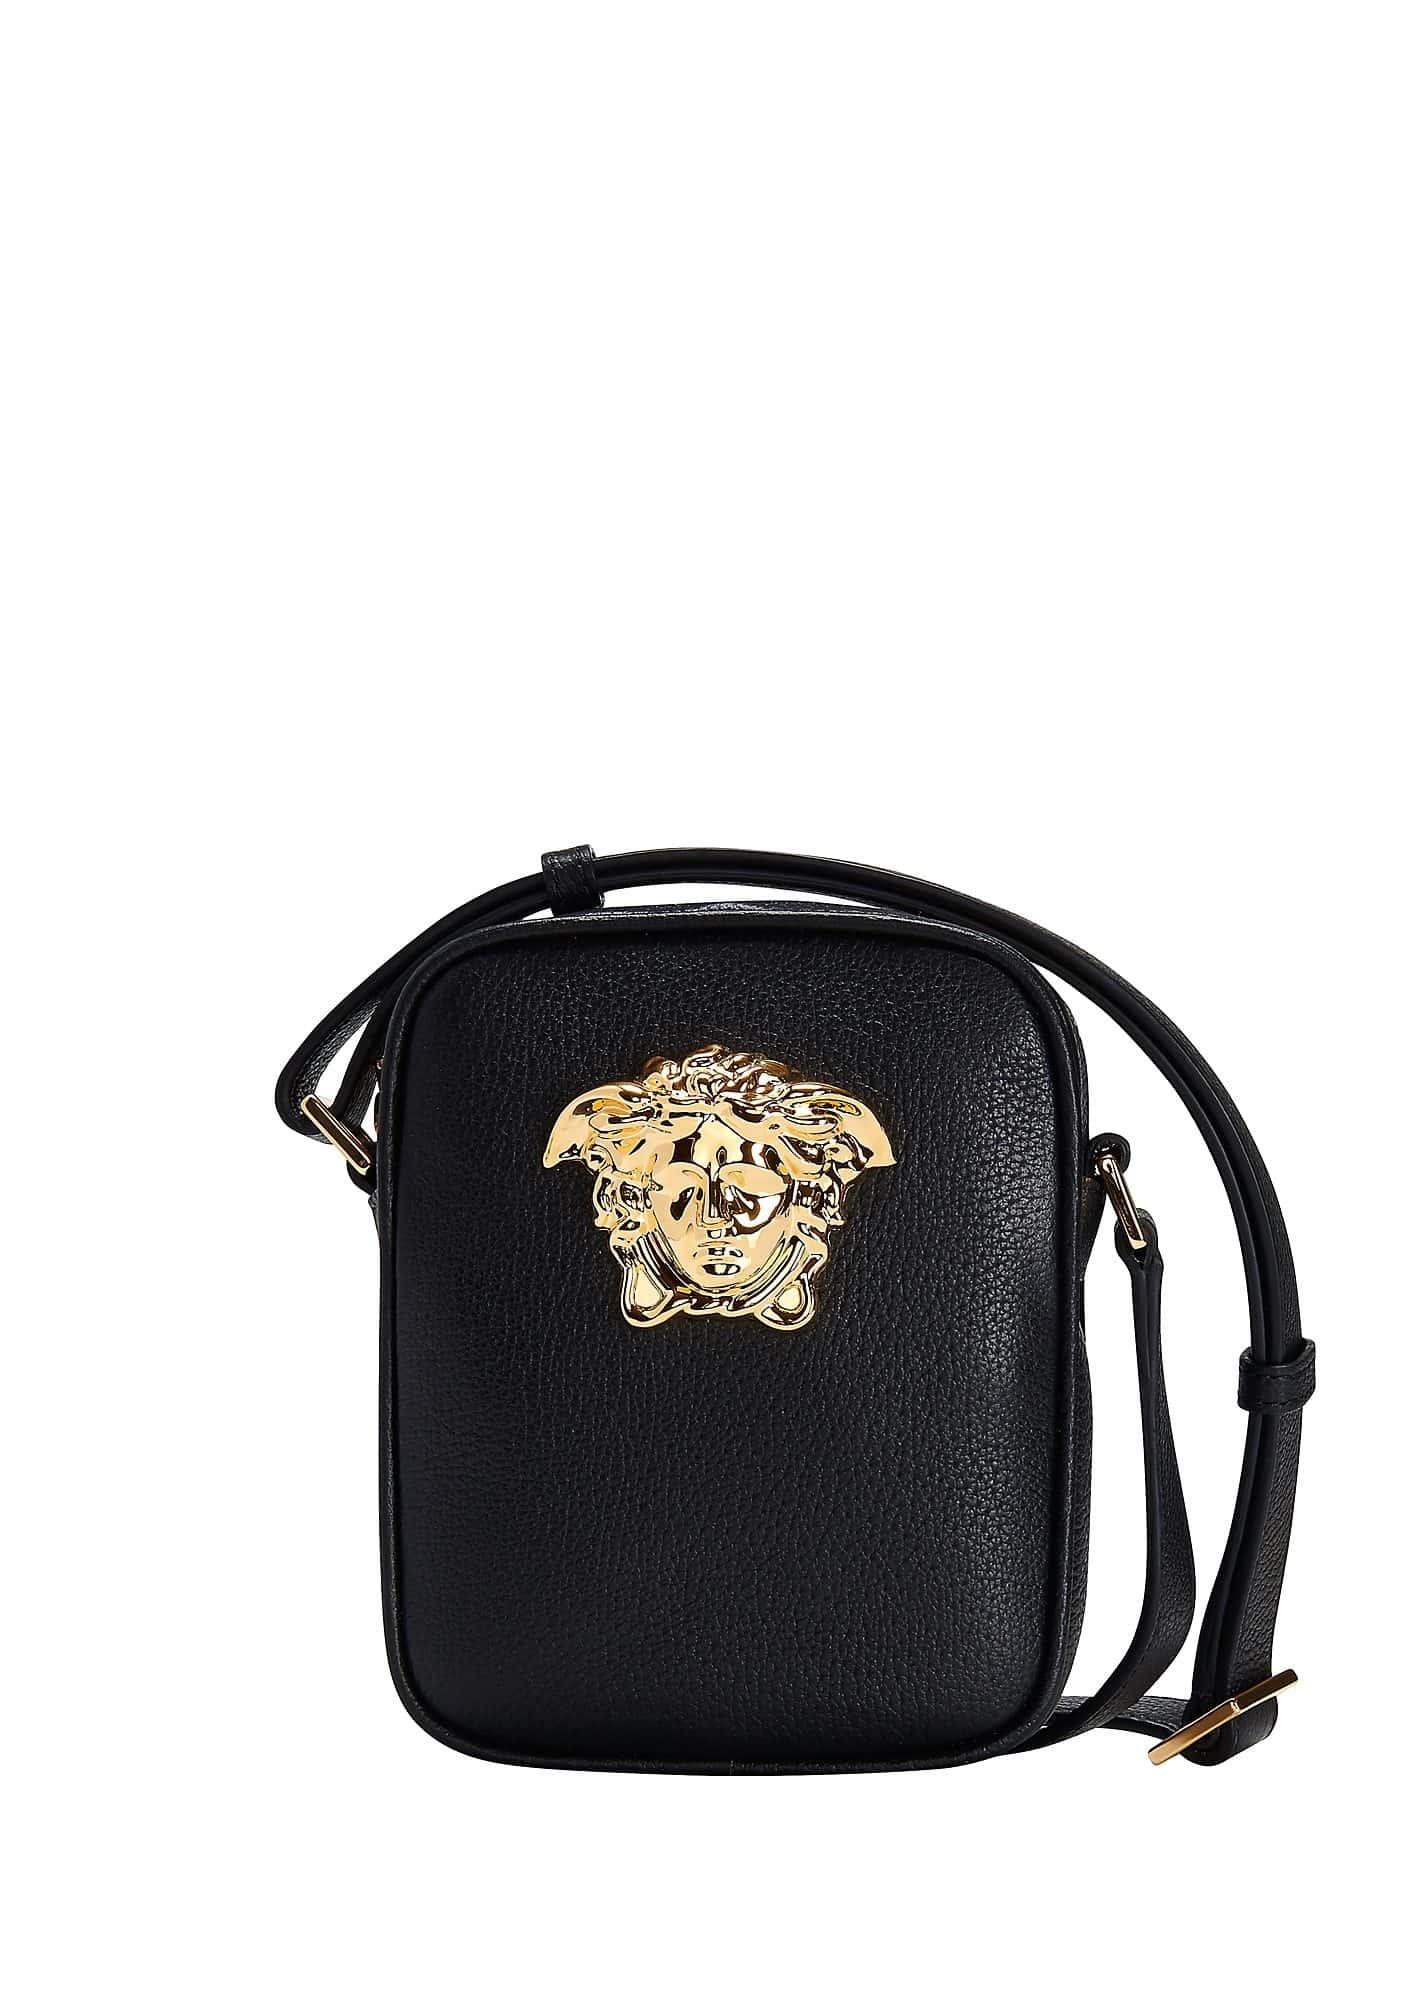 381165b0 Versace-Men-Cross-Body-Bag-Black-Gold-DL25874-DGOV2-D41OH